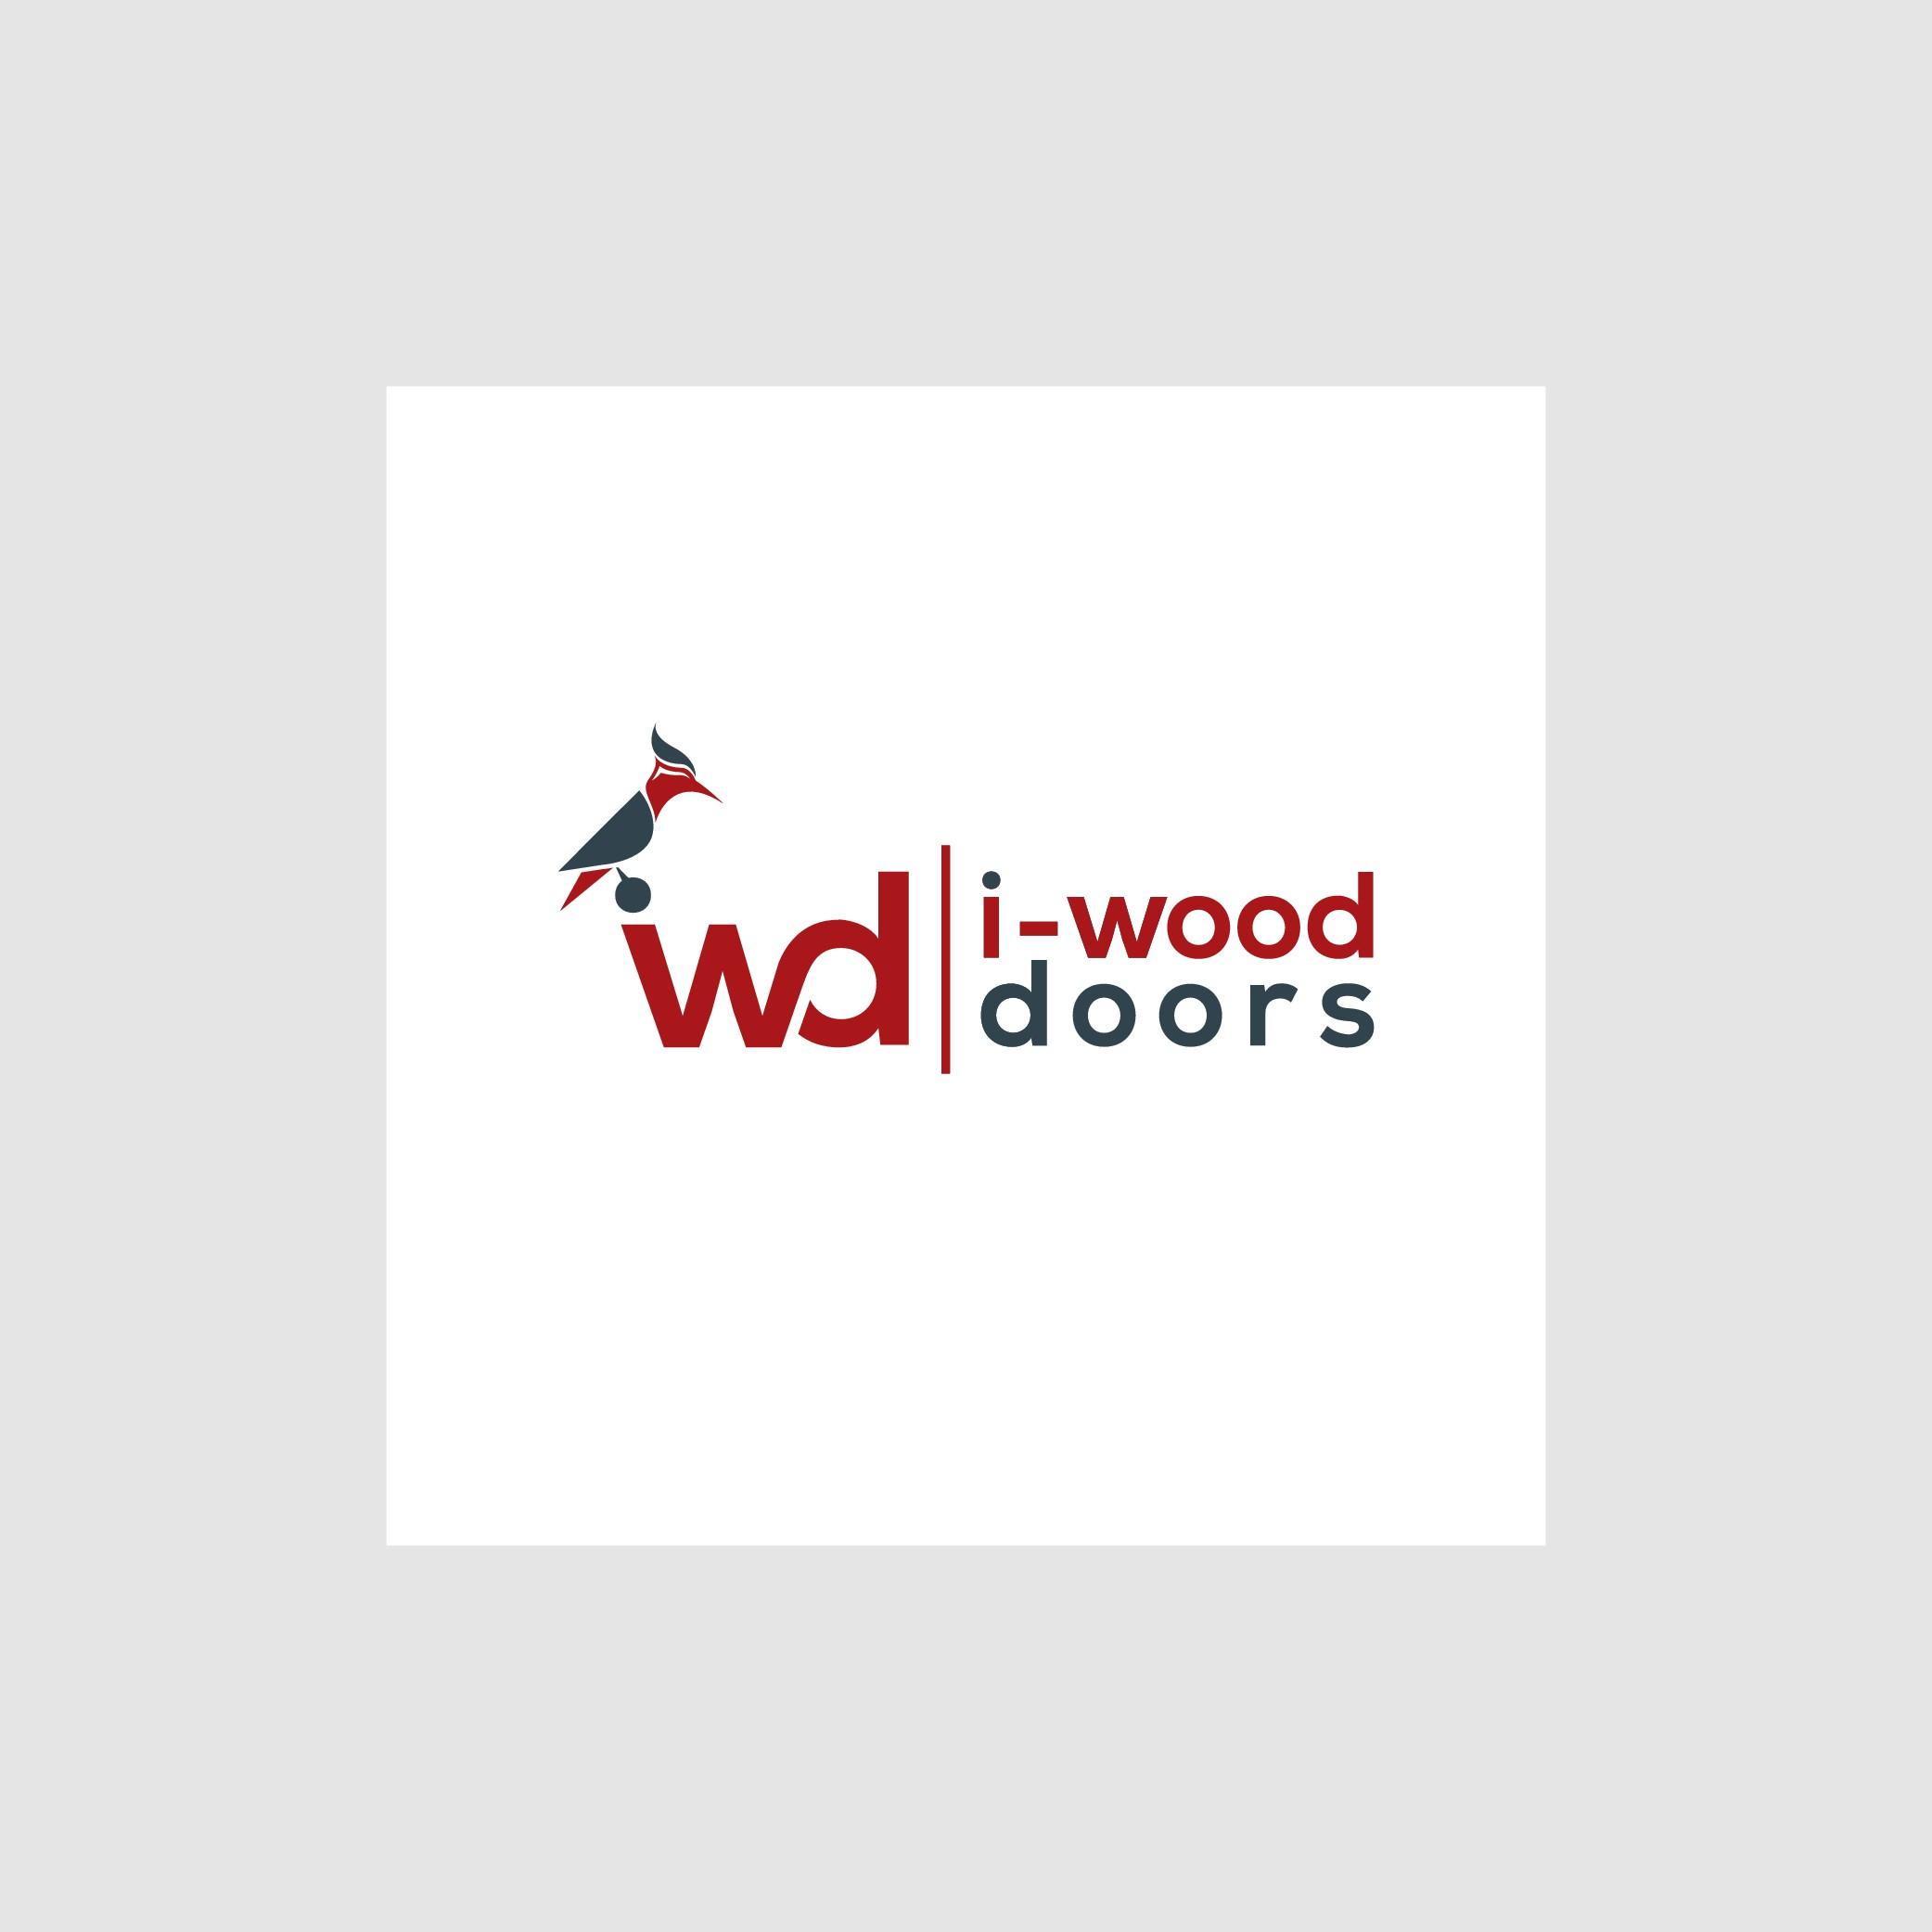 create a attractive and elegant logo for garage door manufacturer